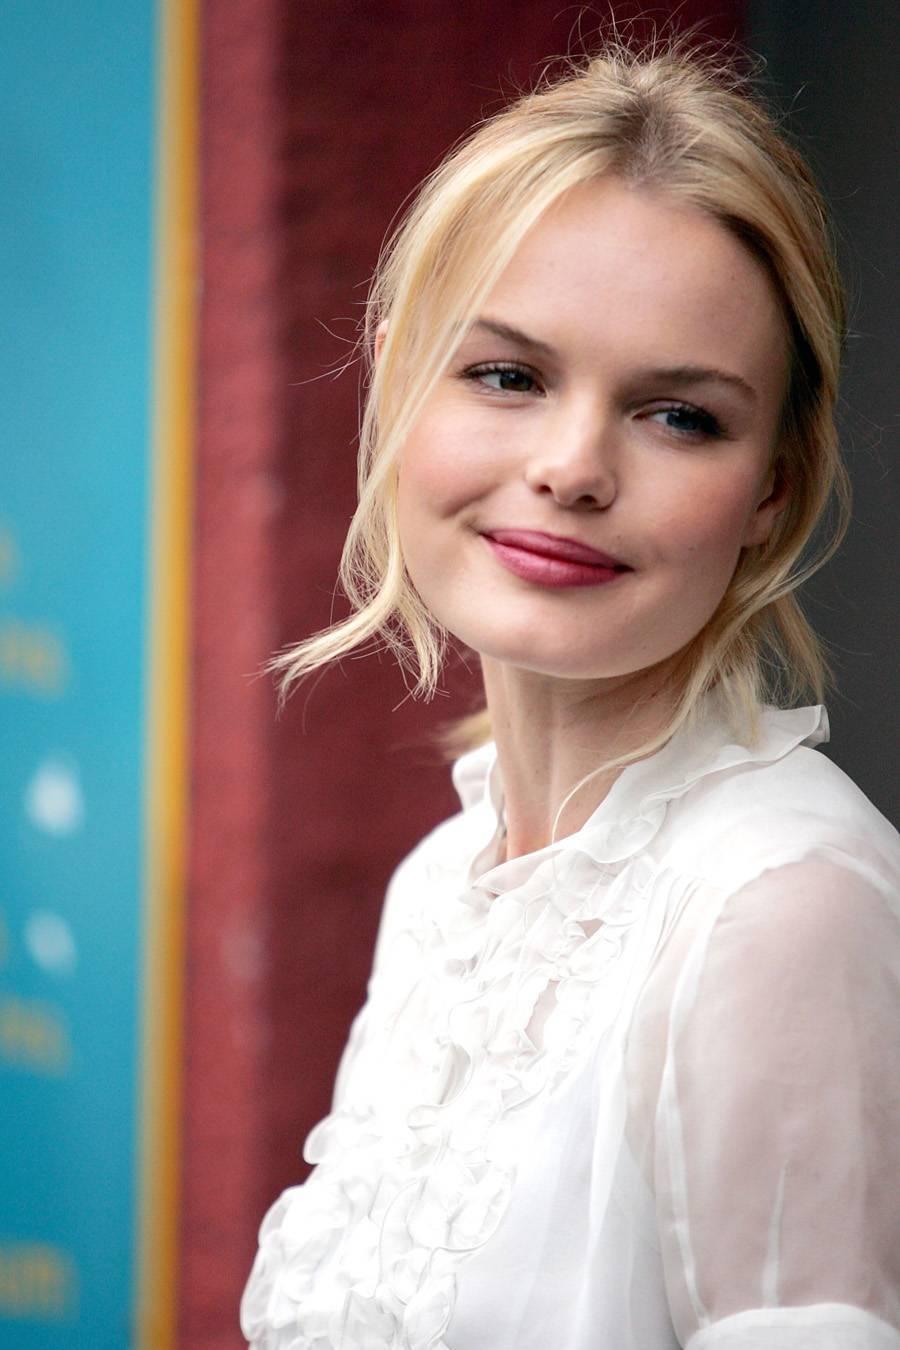 Ladies In Satin Blouses: Kate Bosworth